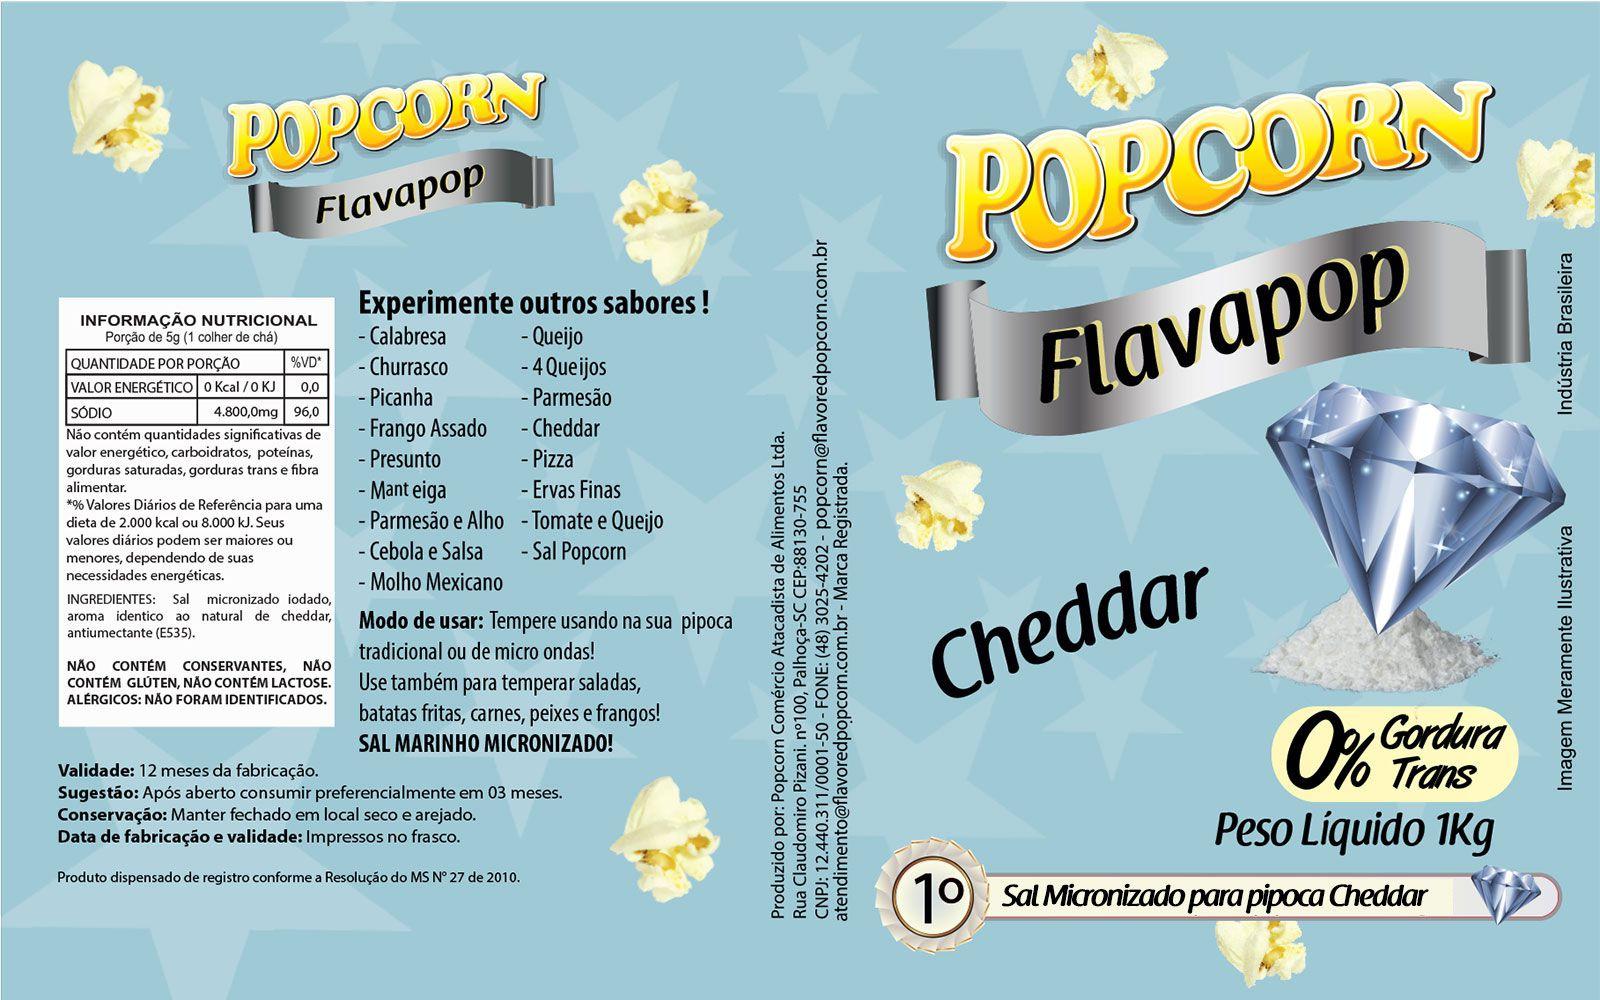 FLAVAPOP - Cheddar - original de cinema - Micronizado Popcorn  - Pct 1kg